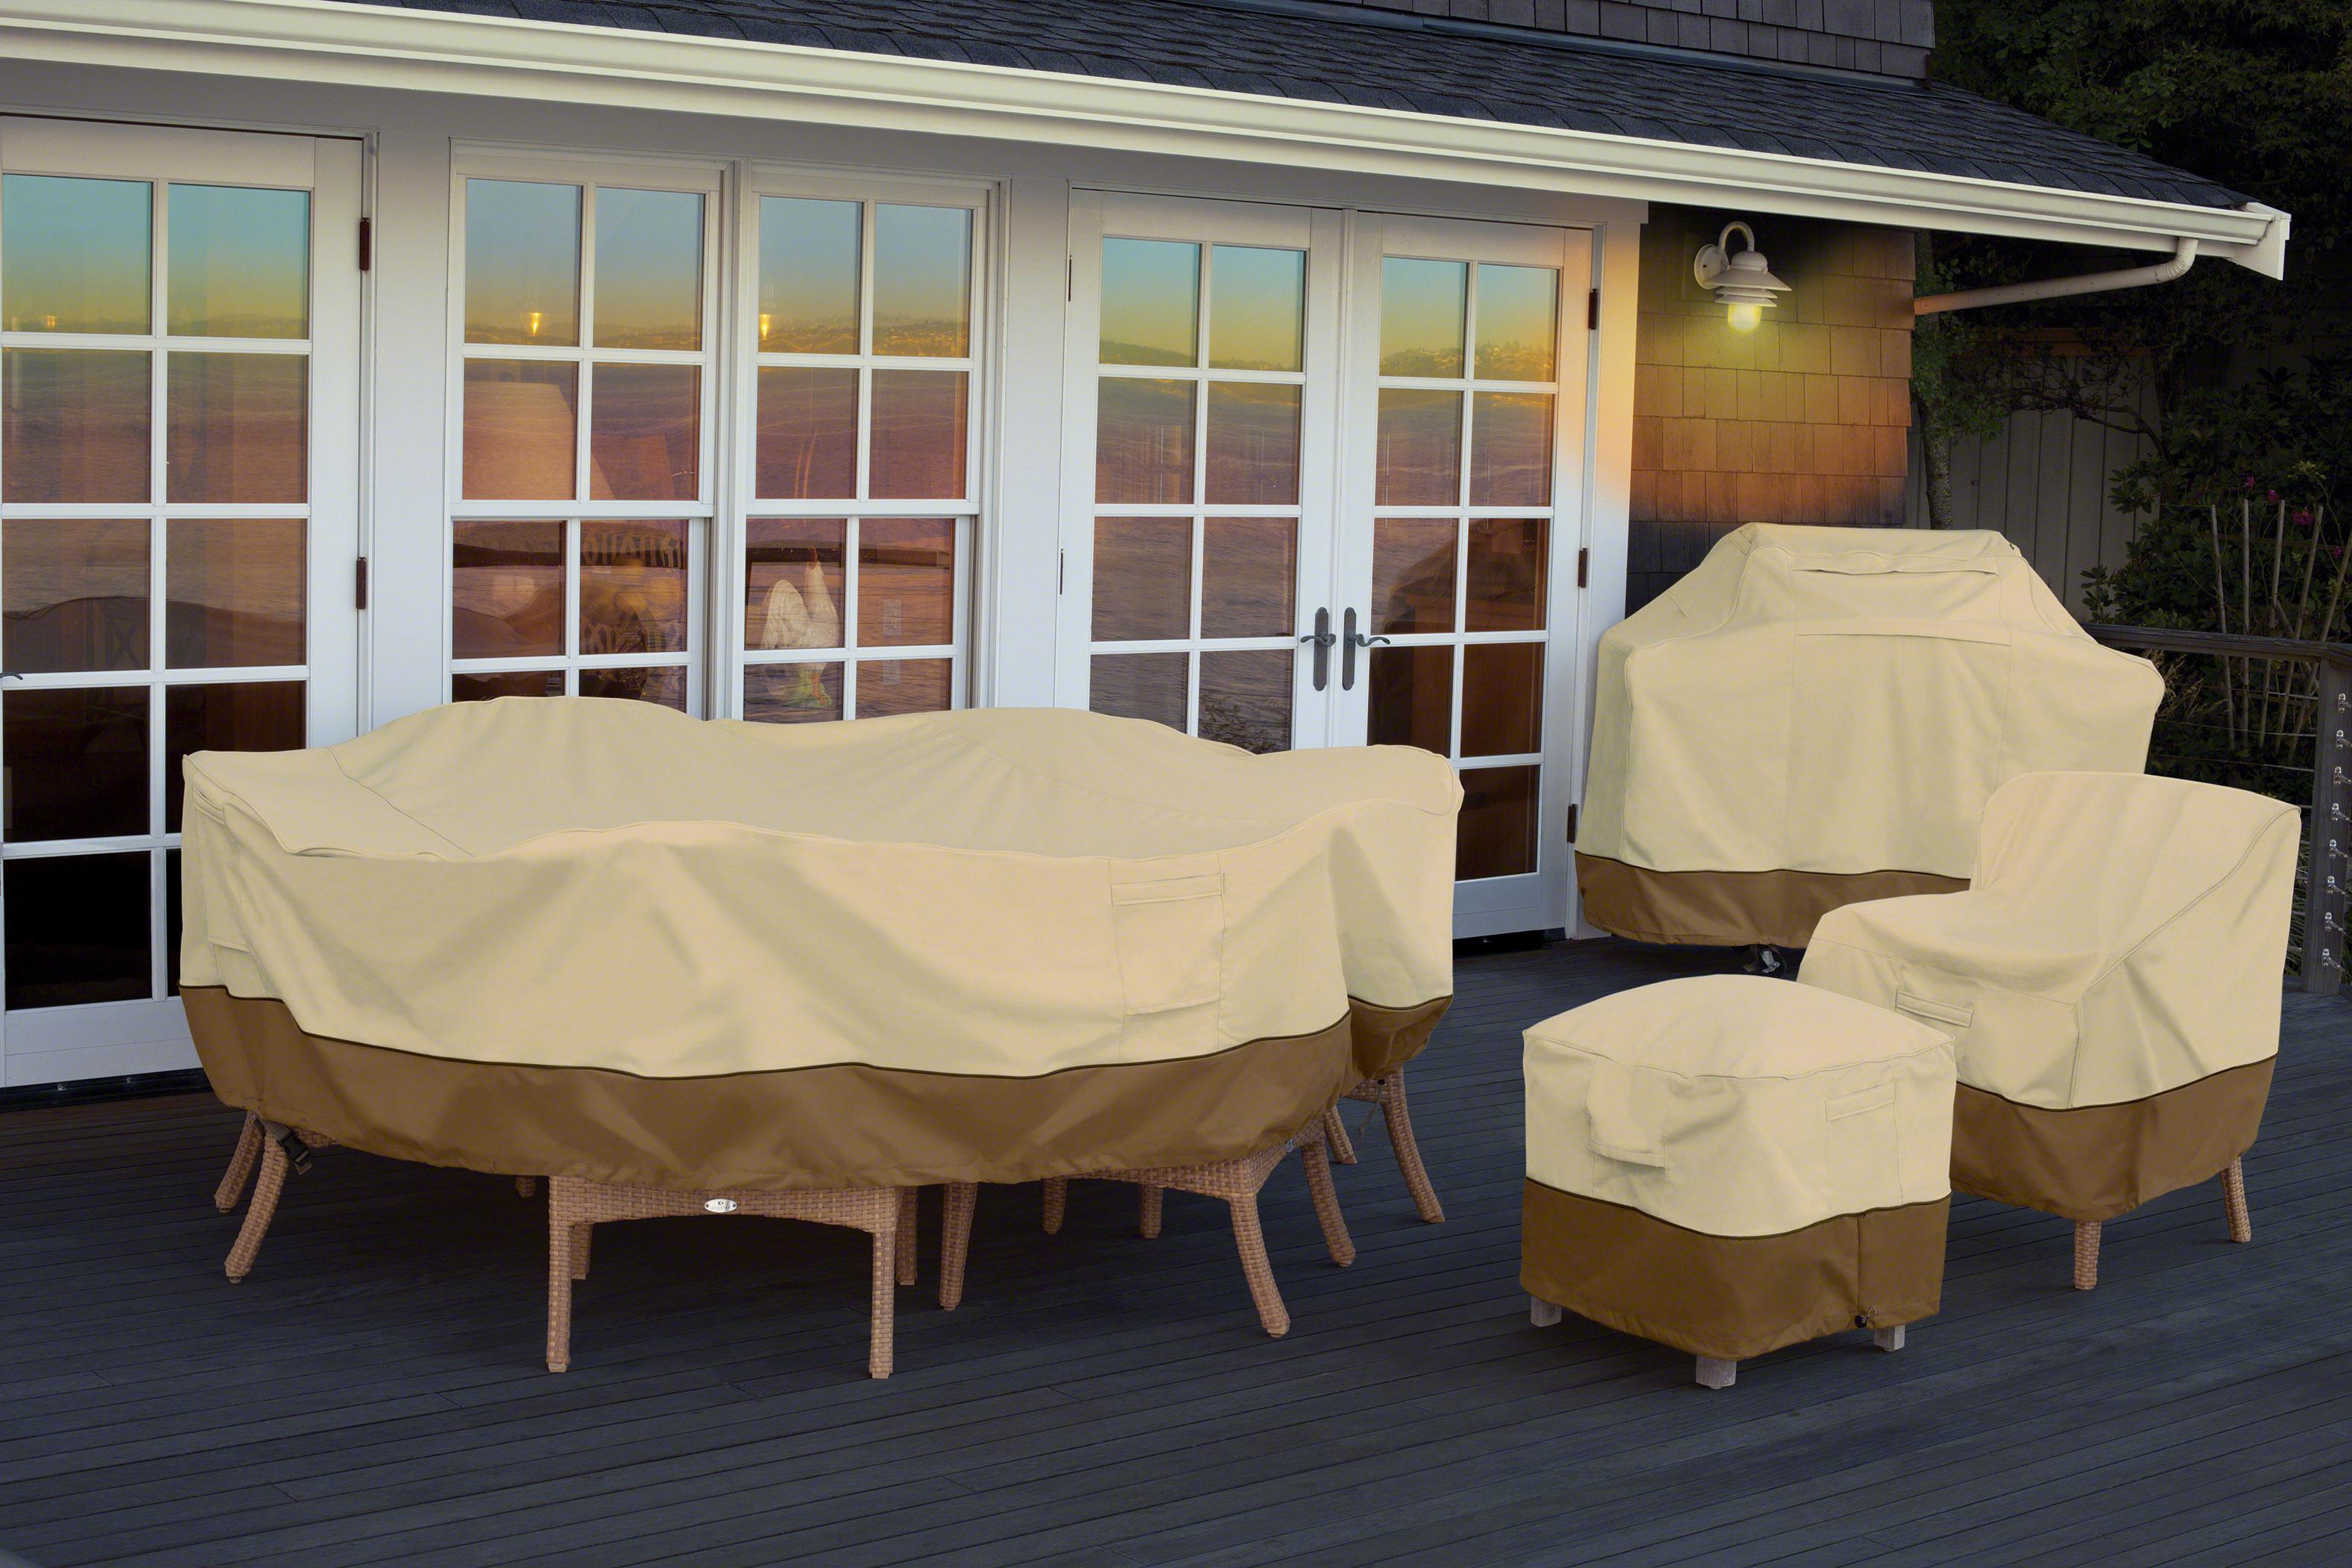 classic accessories 55 233 011501 00 veranda patio bistro table chair set cover. Black Bedroom Furniture Sets. Home Design Ideas